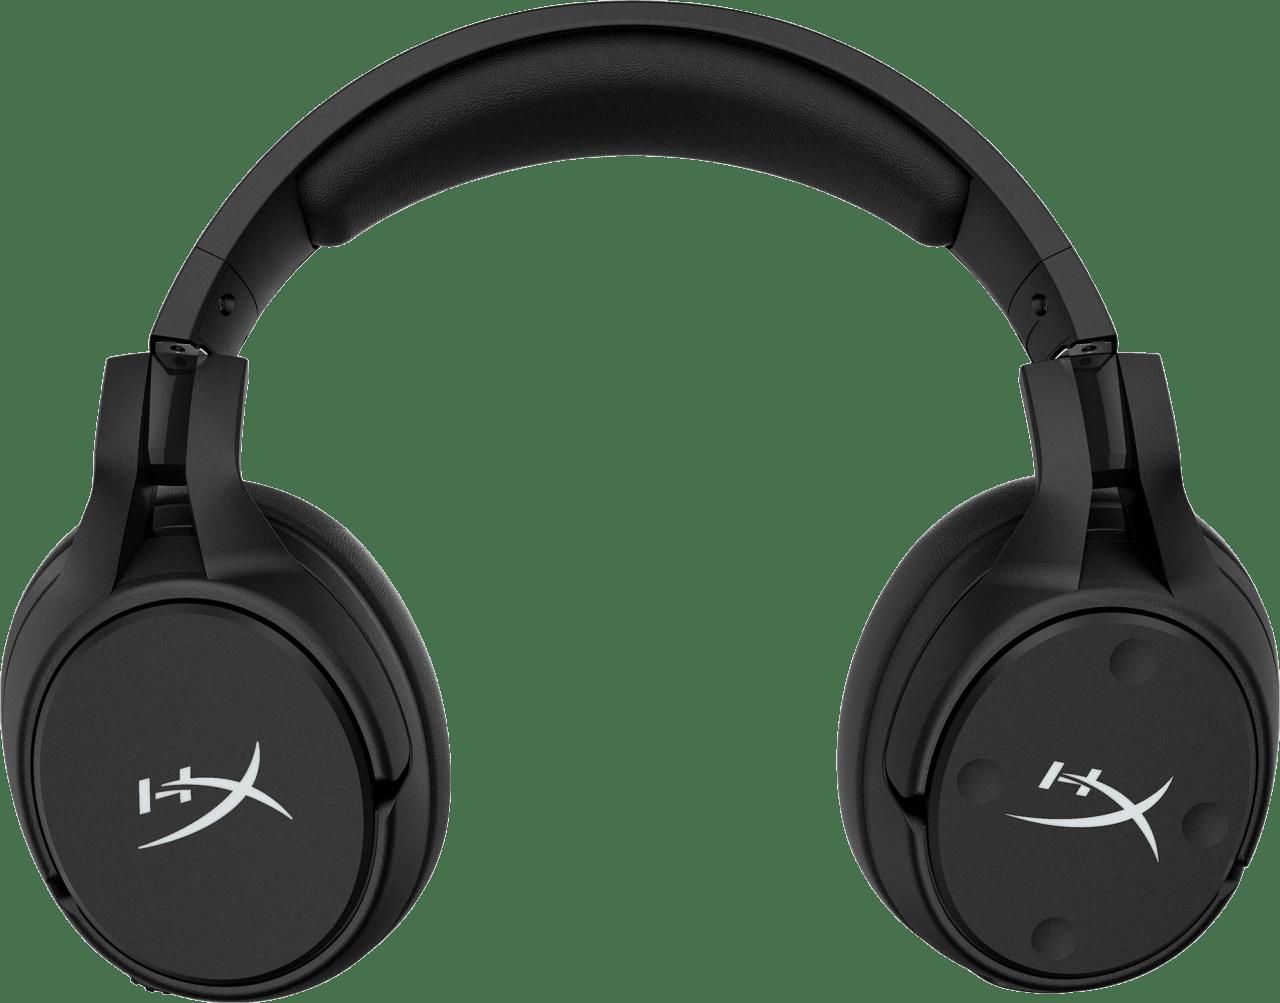 Schwarz HyperX Cloud Flight S Over-Ear-Gaming-Kopfhörer.4